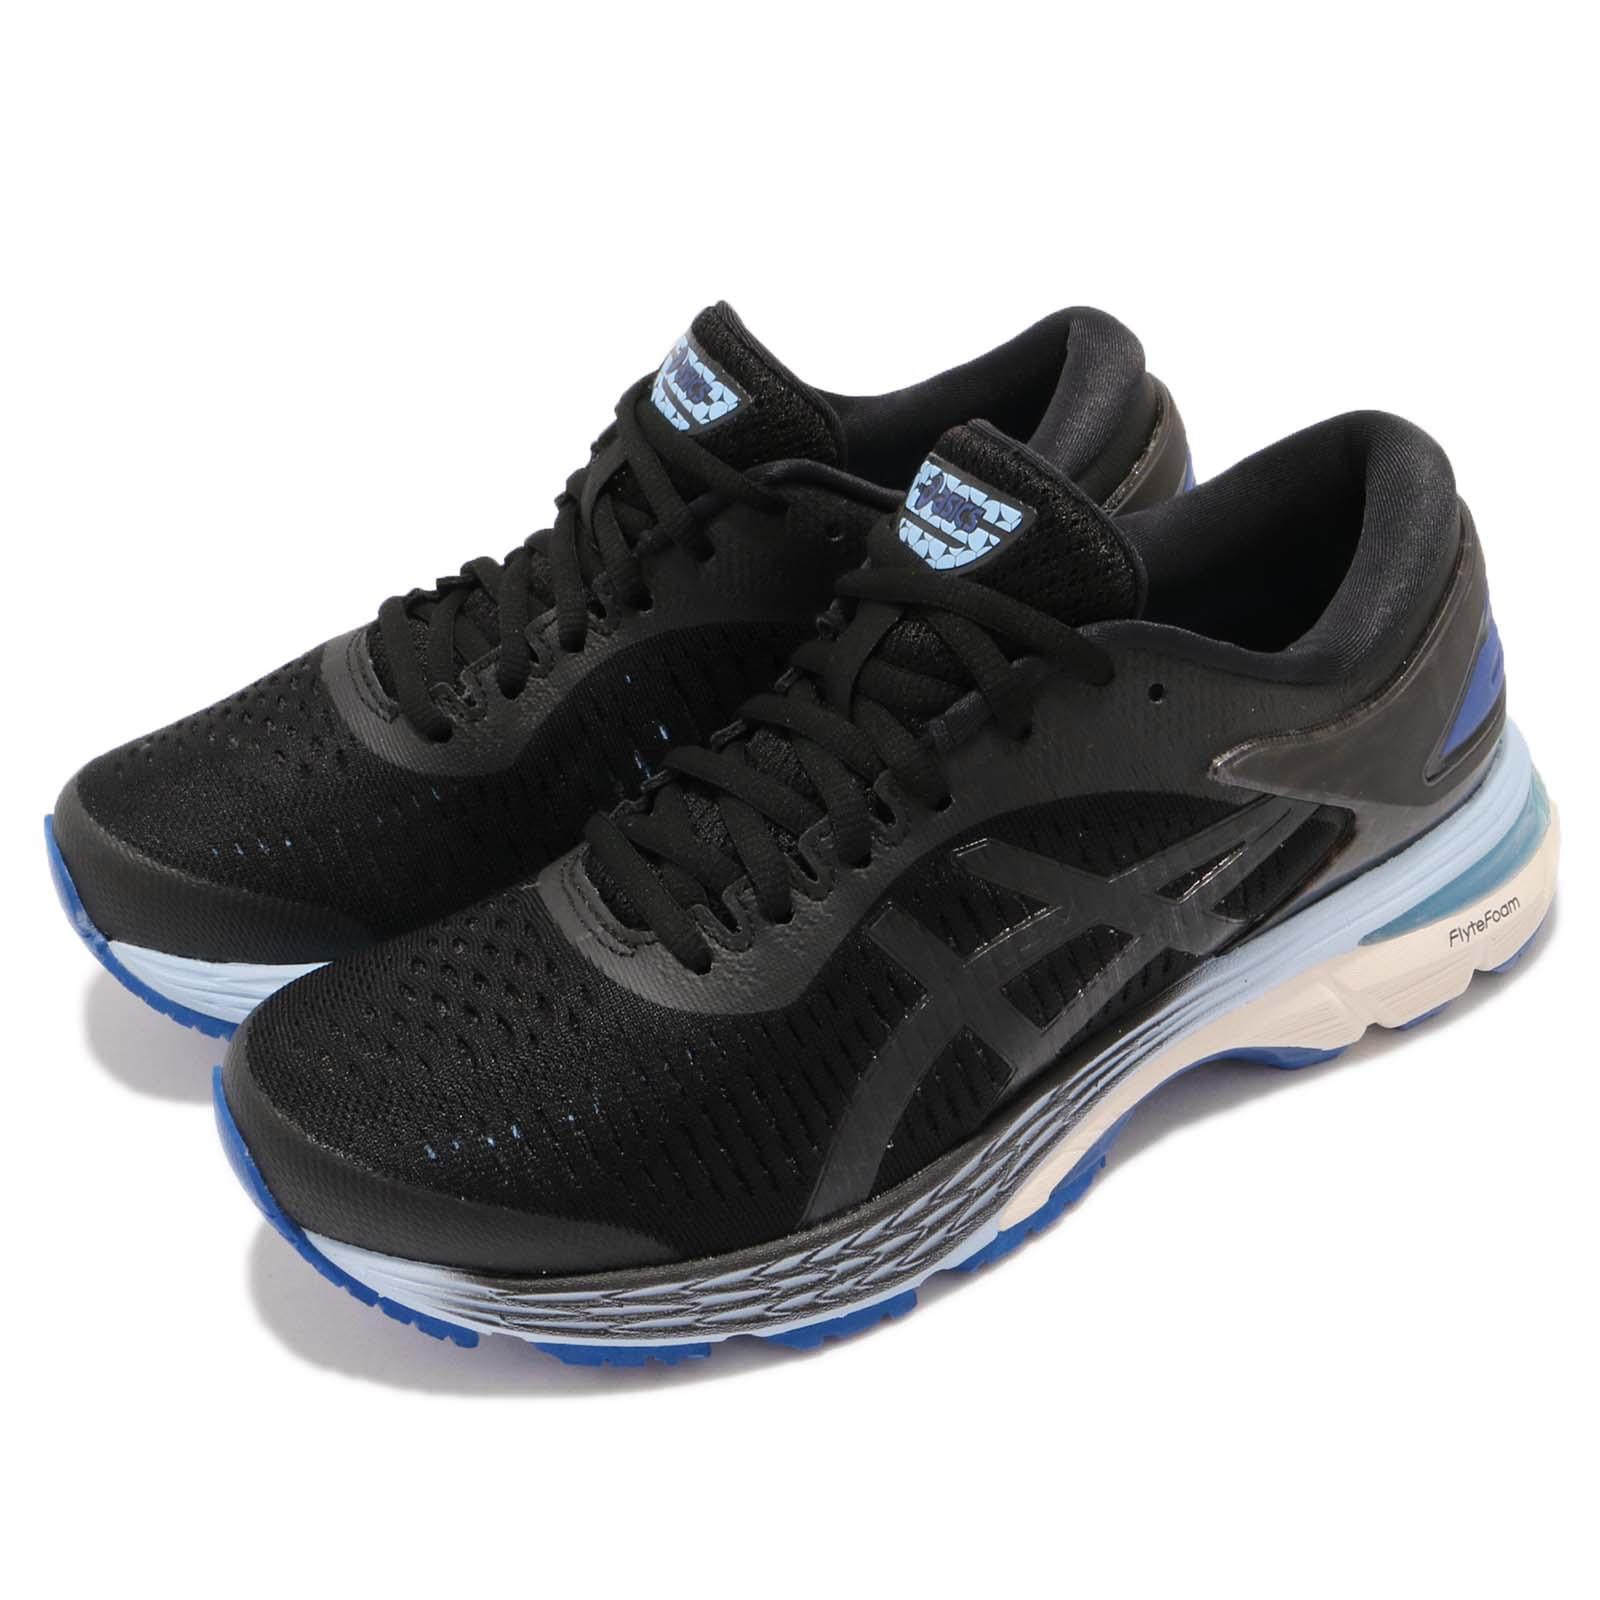 Asics 慢跑鞋 Gel-Kayano 25 女鞋 1012A026001